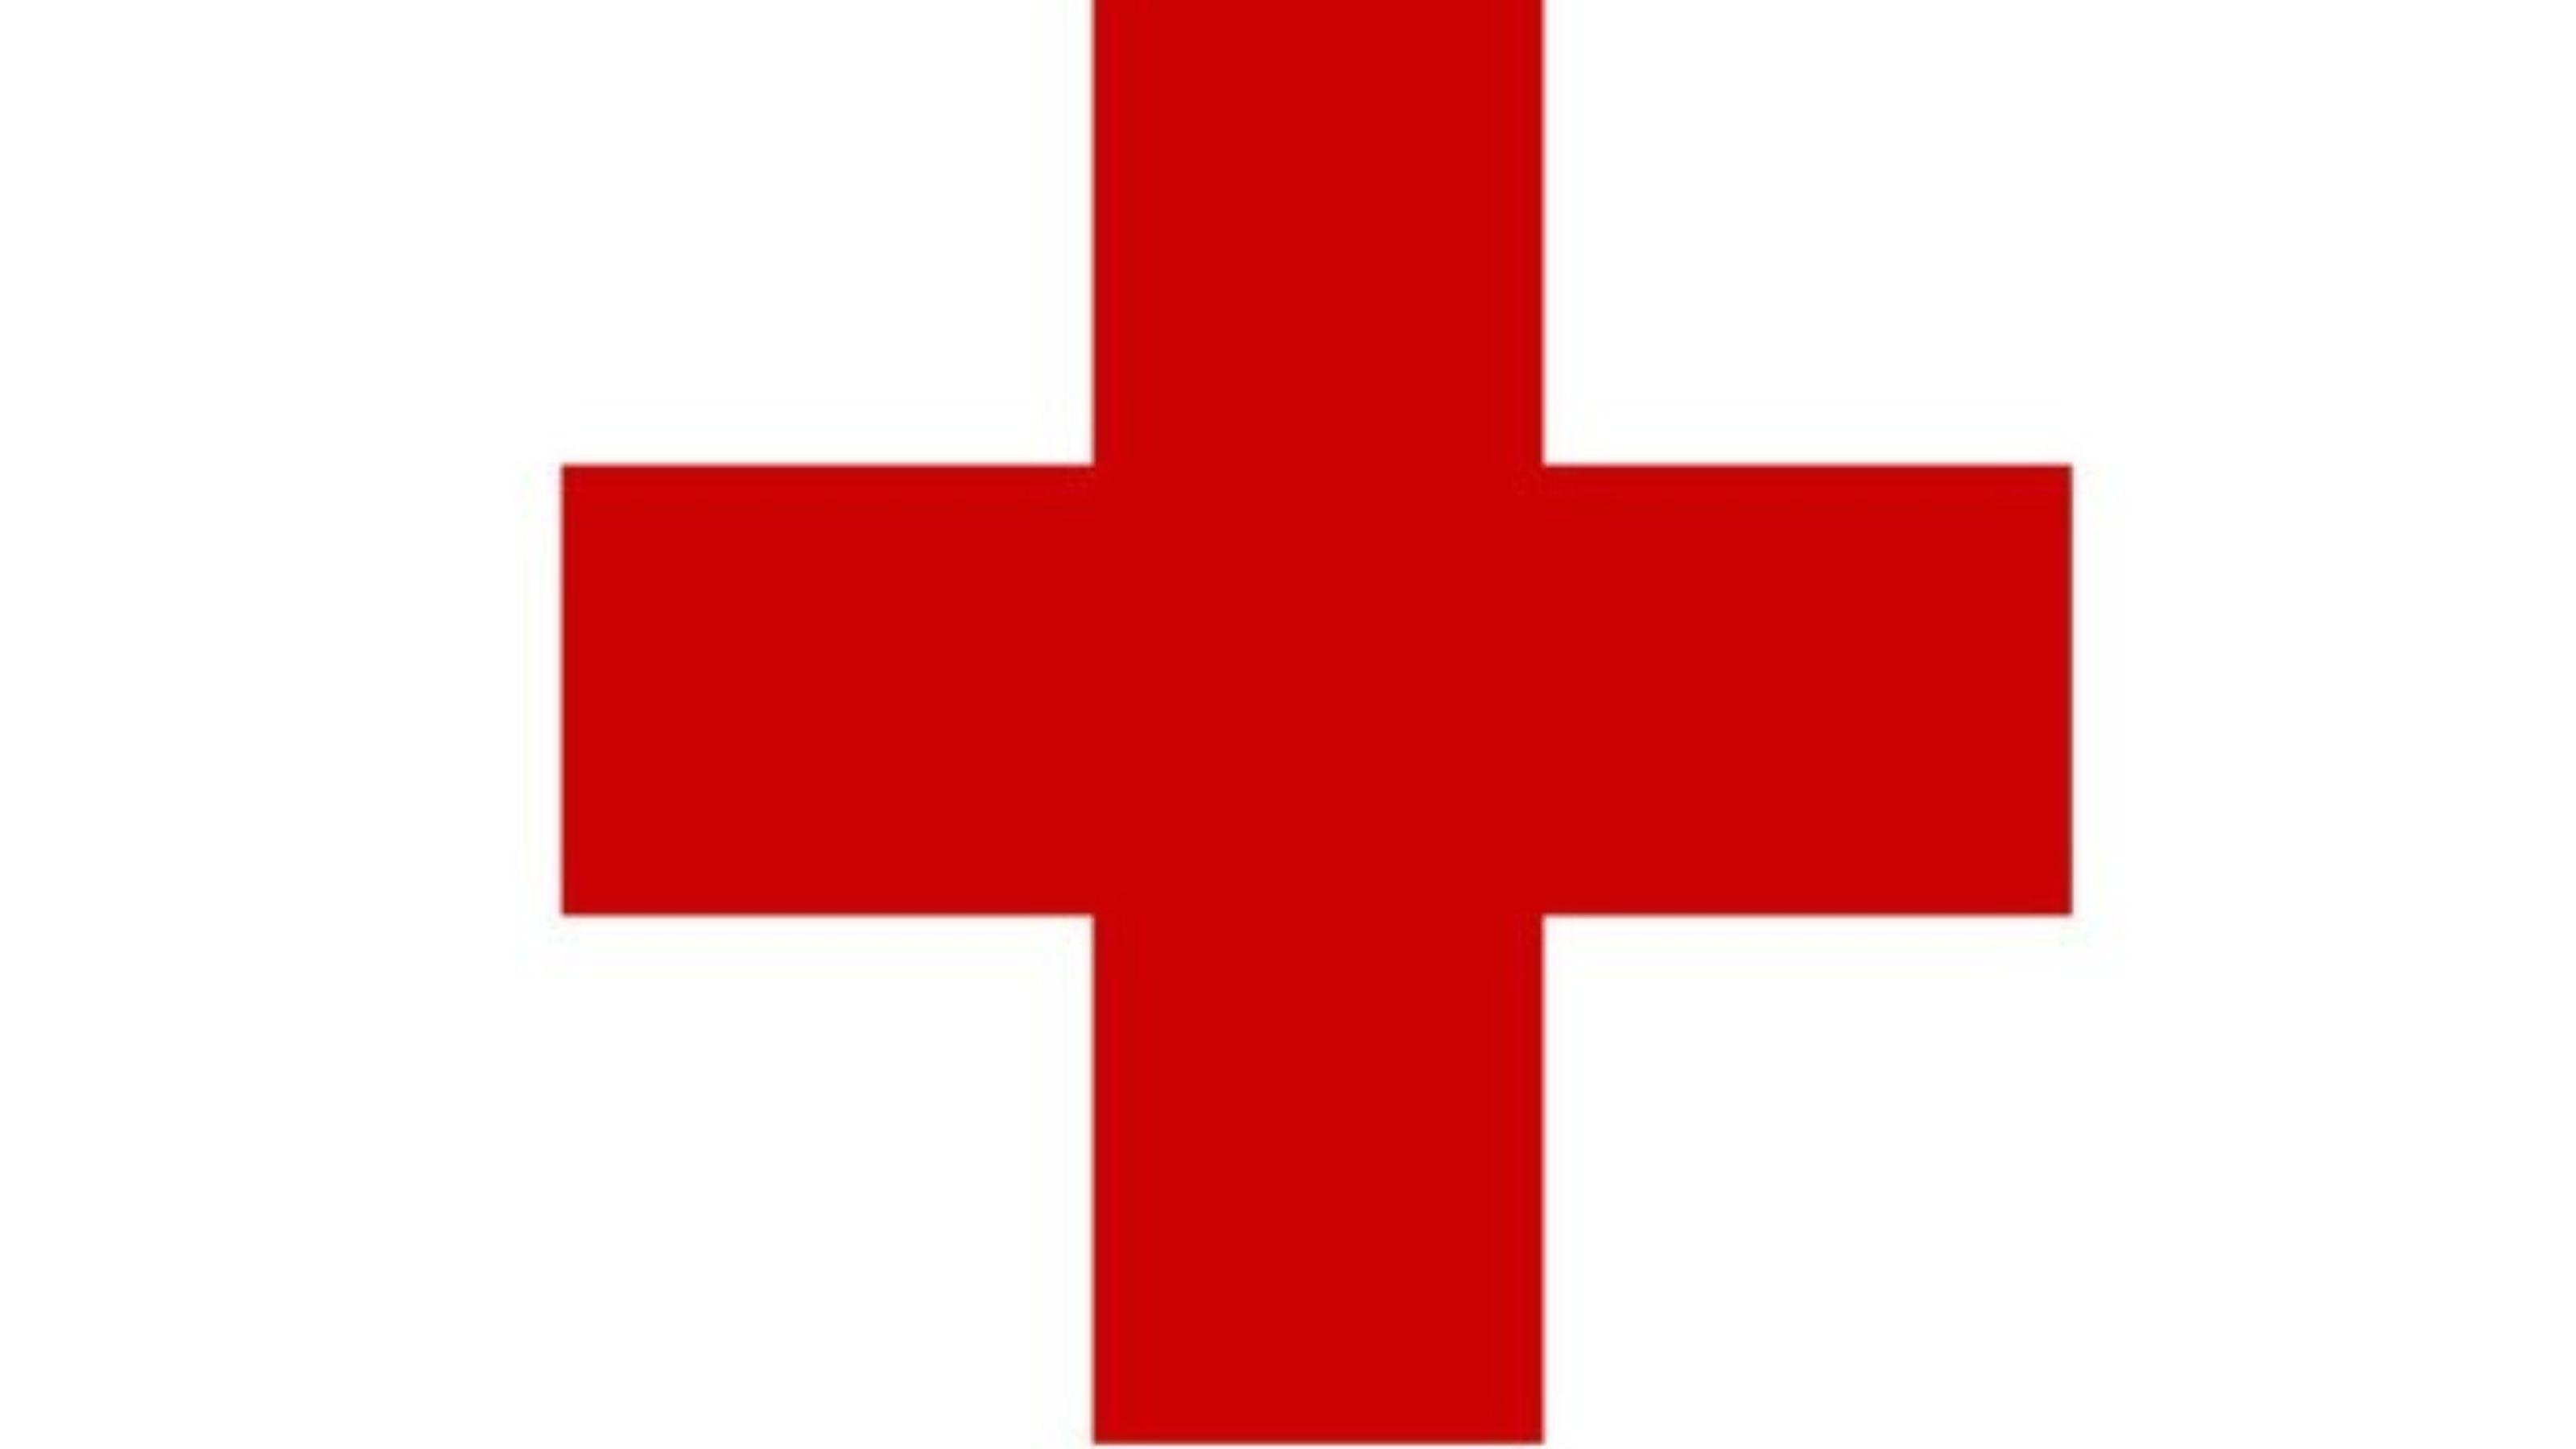 3200x1800 American Red Cross Logo Clip Art